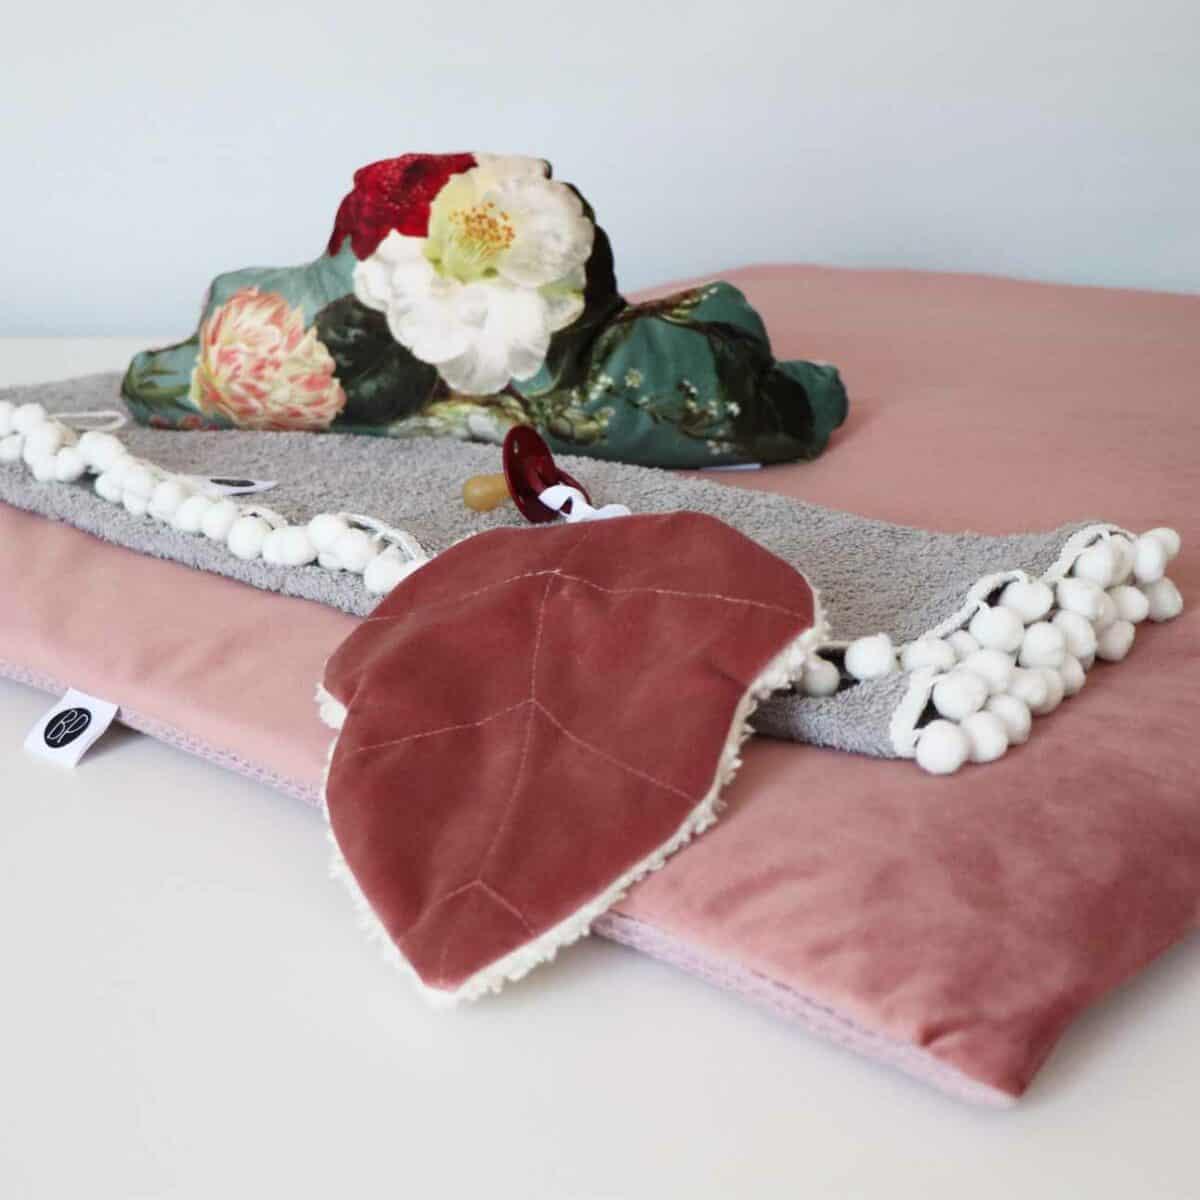 Vierkant boxkleed velvet roze met bloemen accessoires